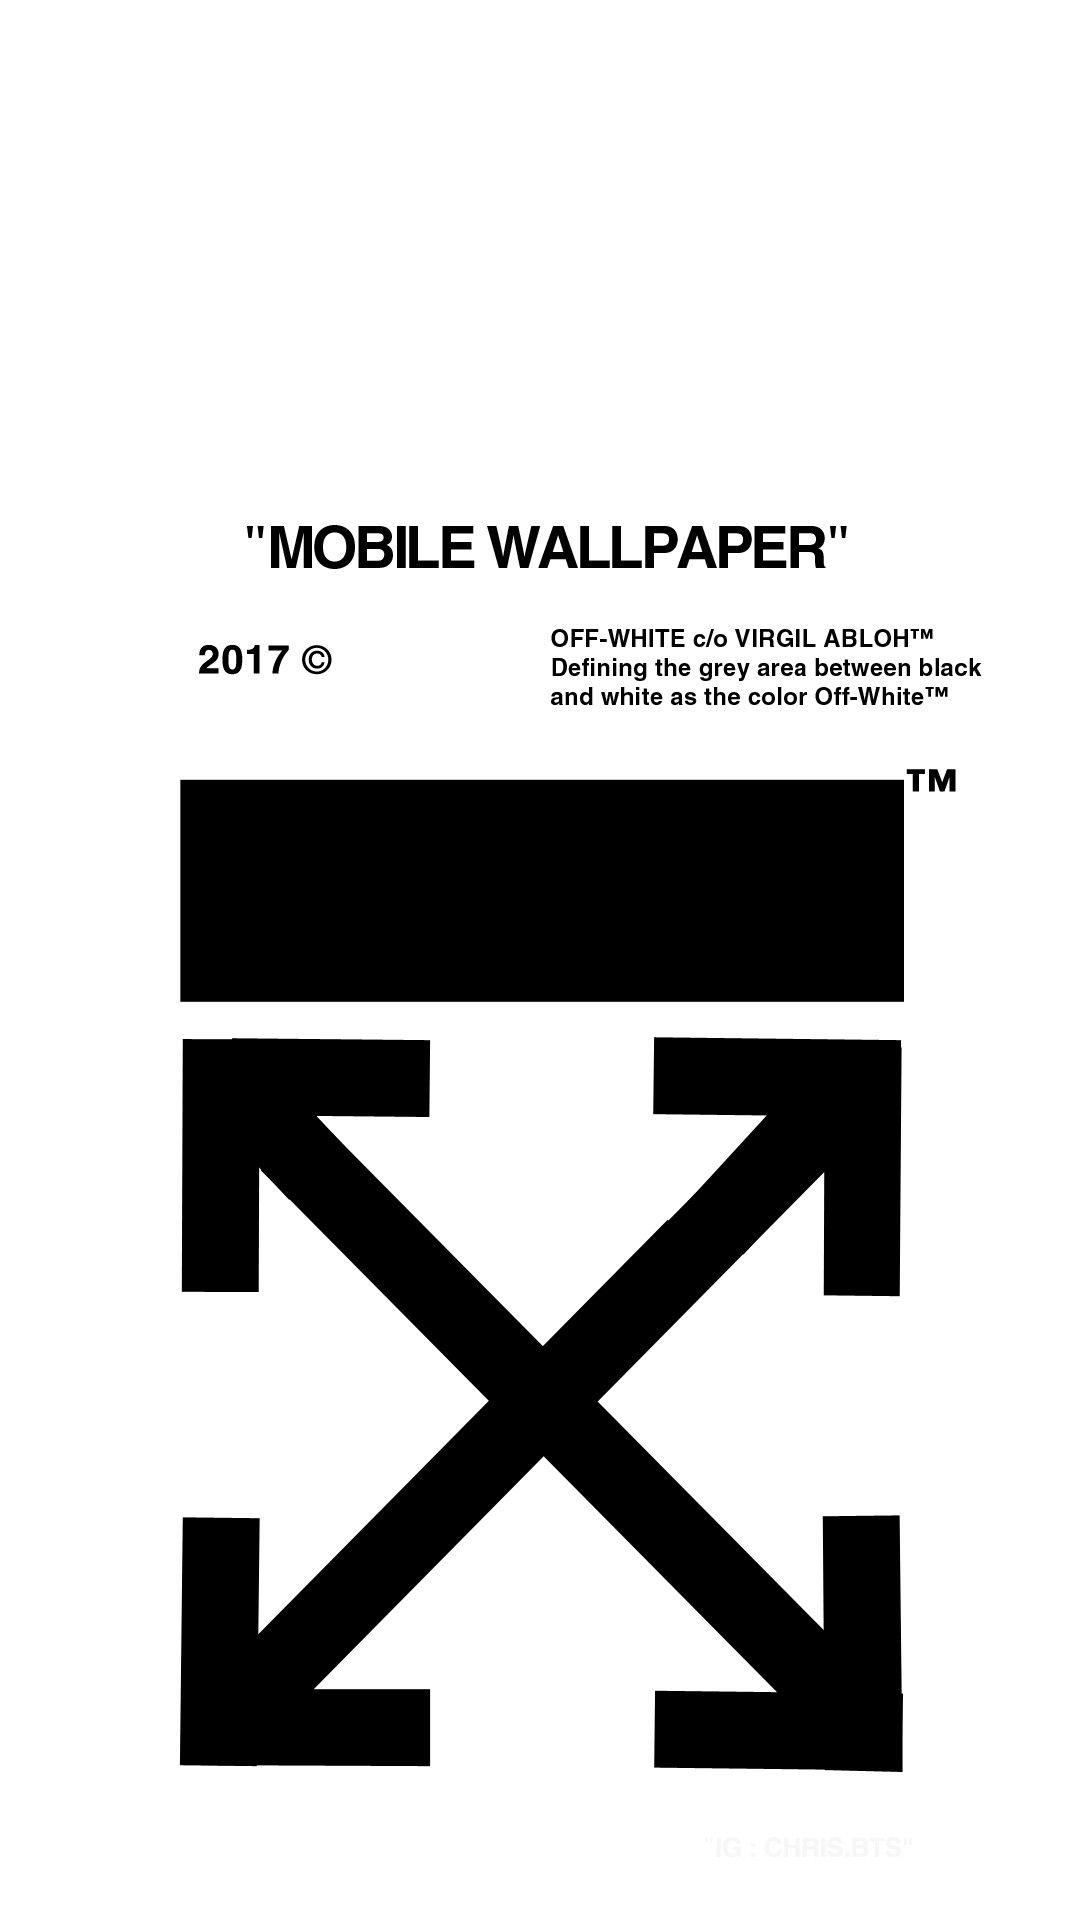 OFF-WHITHE White Wallpaper   Wallpapers⭐ en 2019   Hypebeast wallpaper, White wallpaper for ...